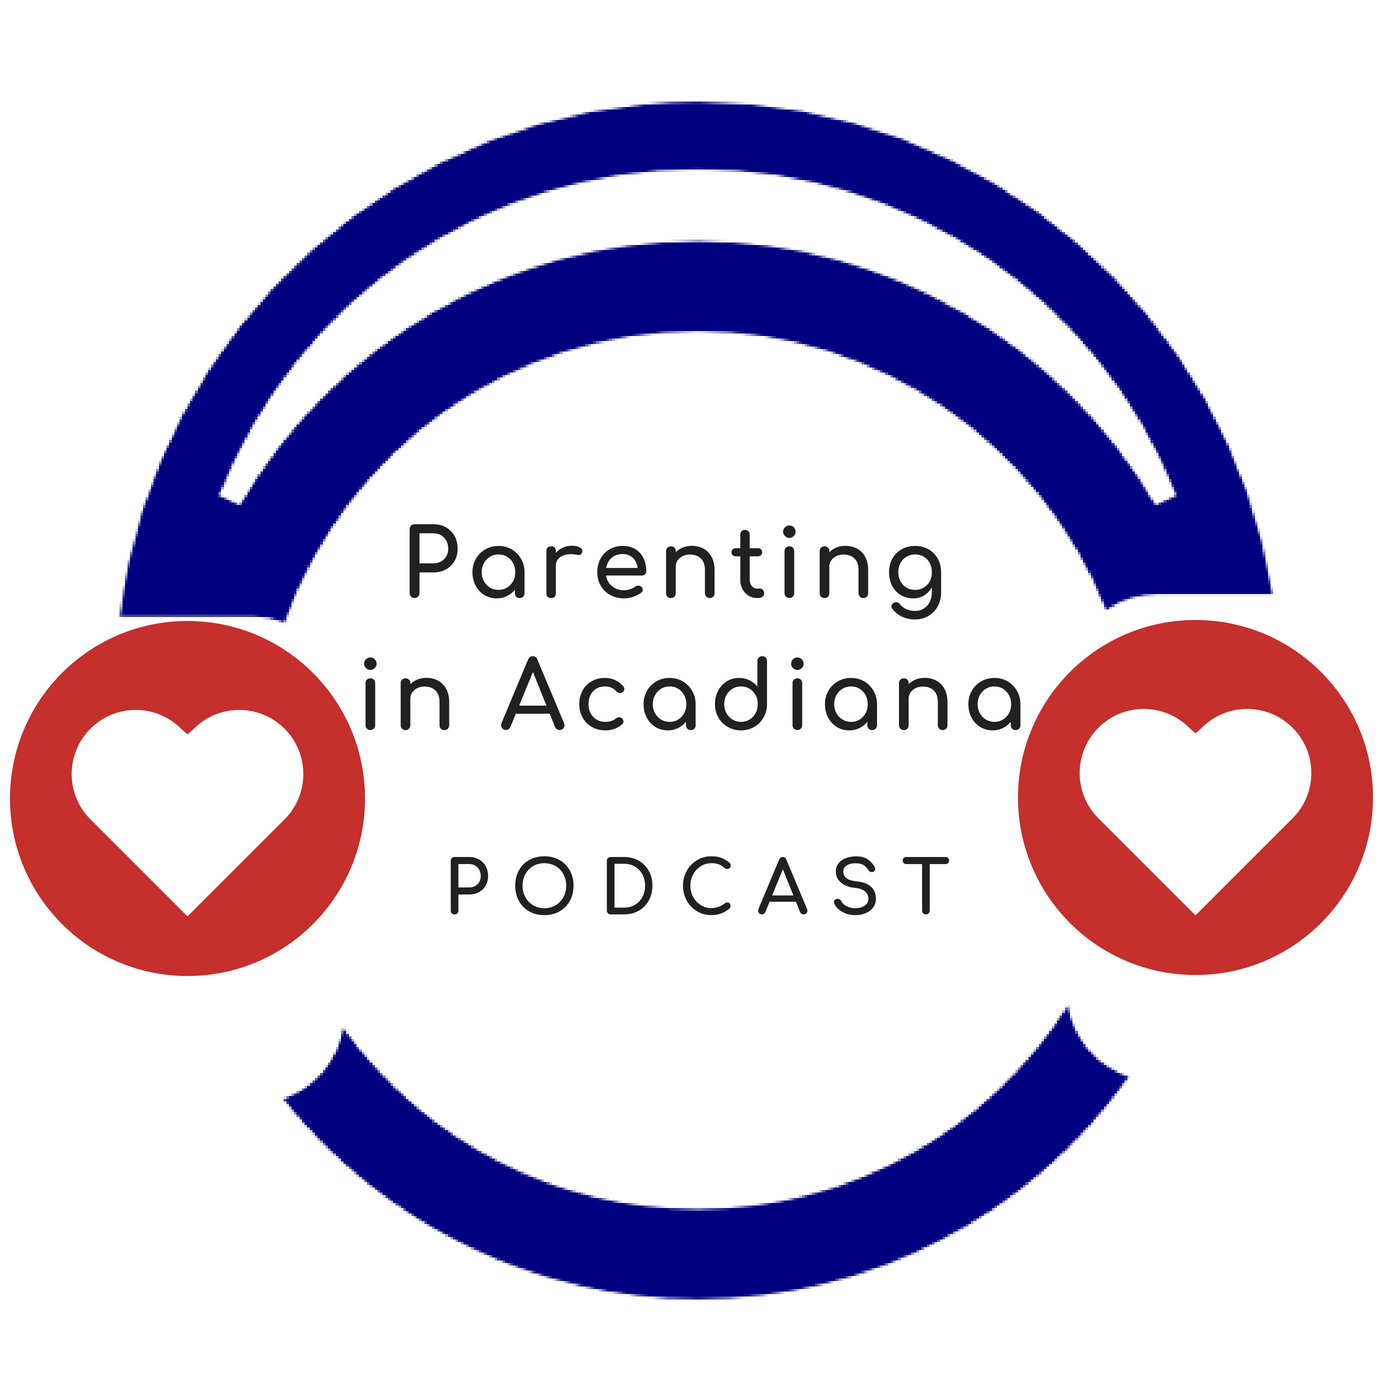 Parenting in Acadiana